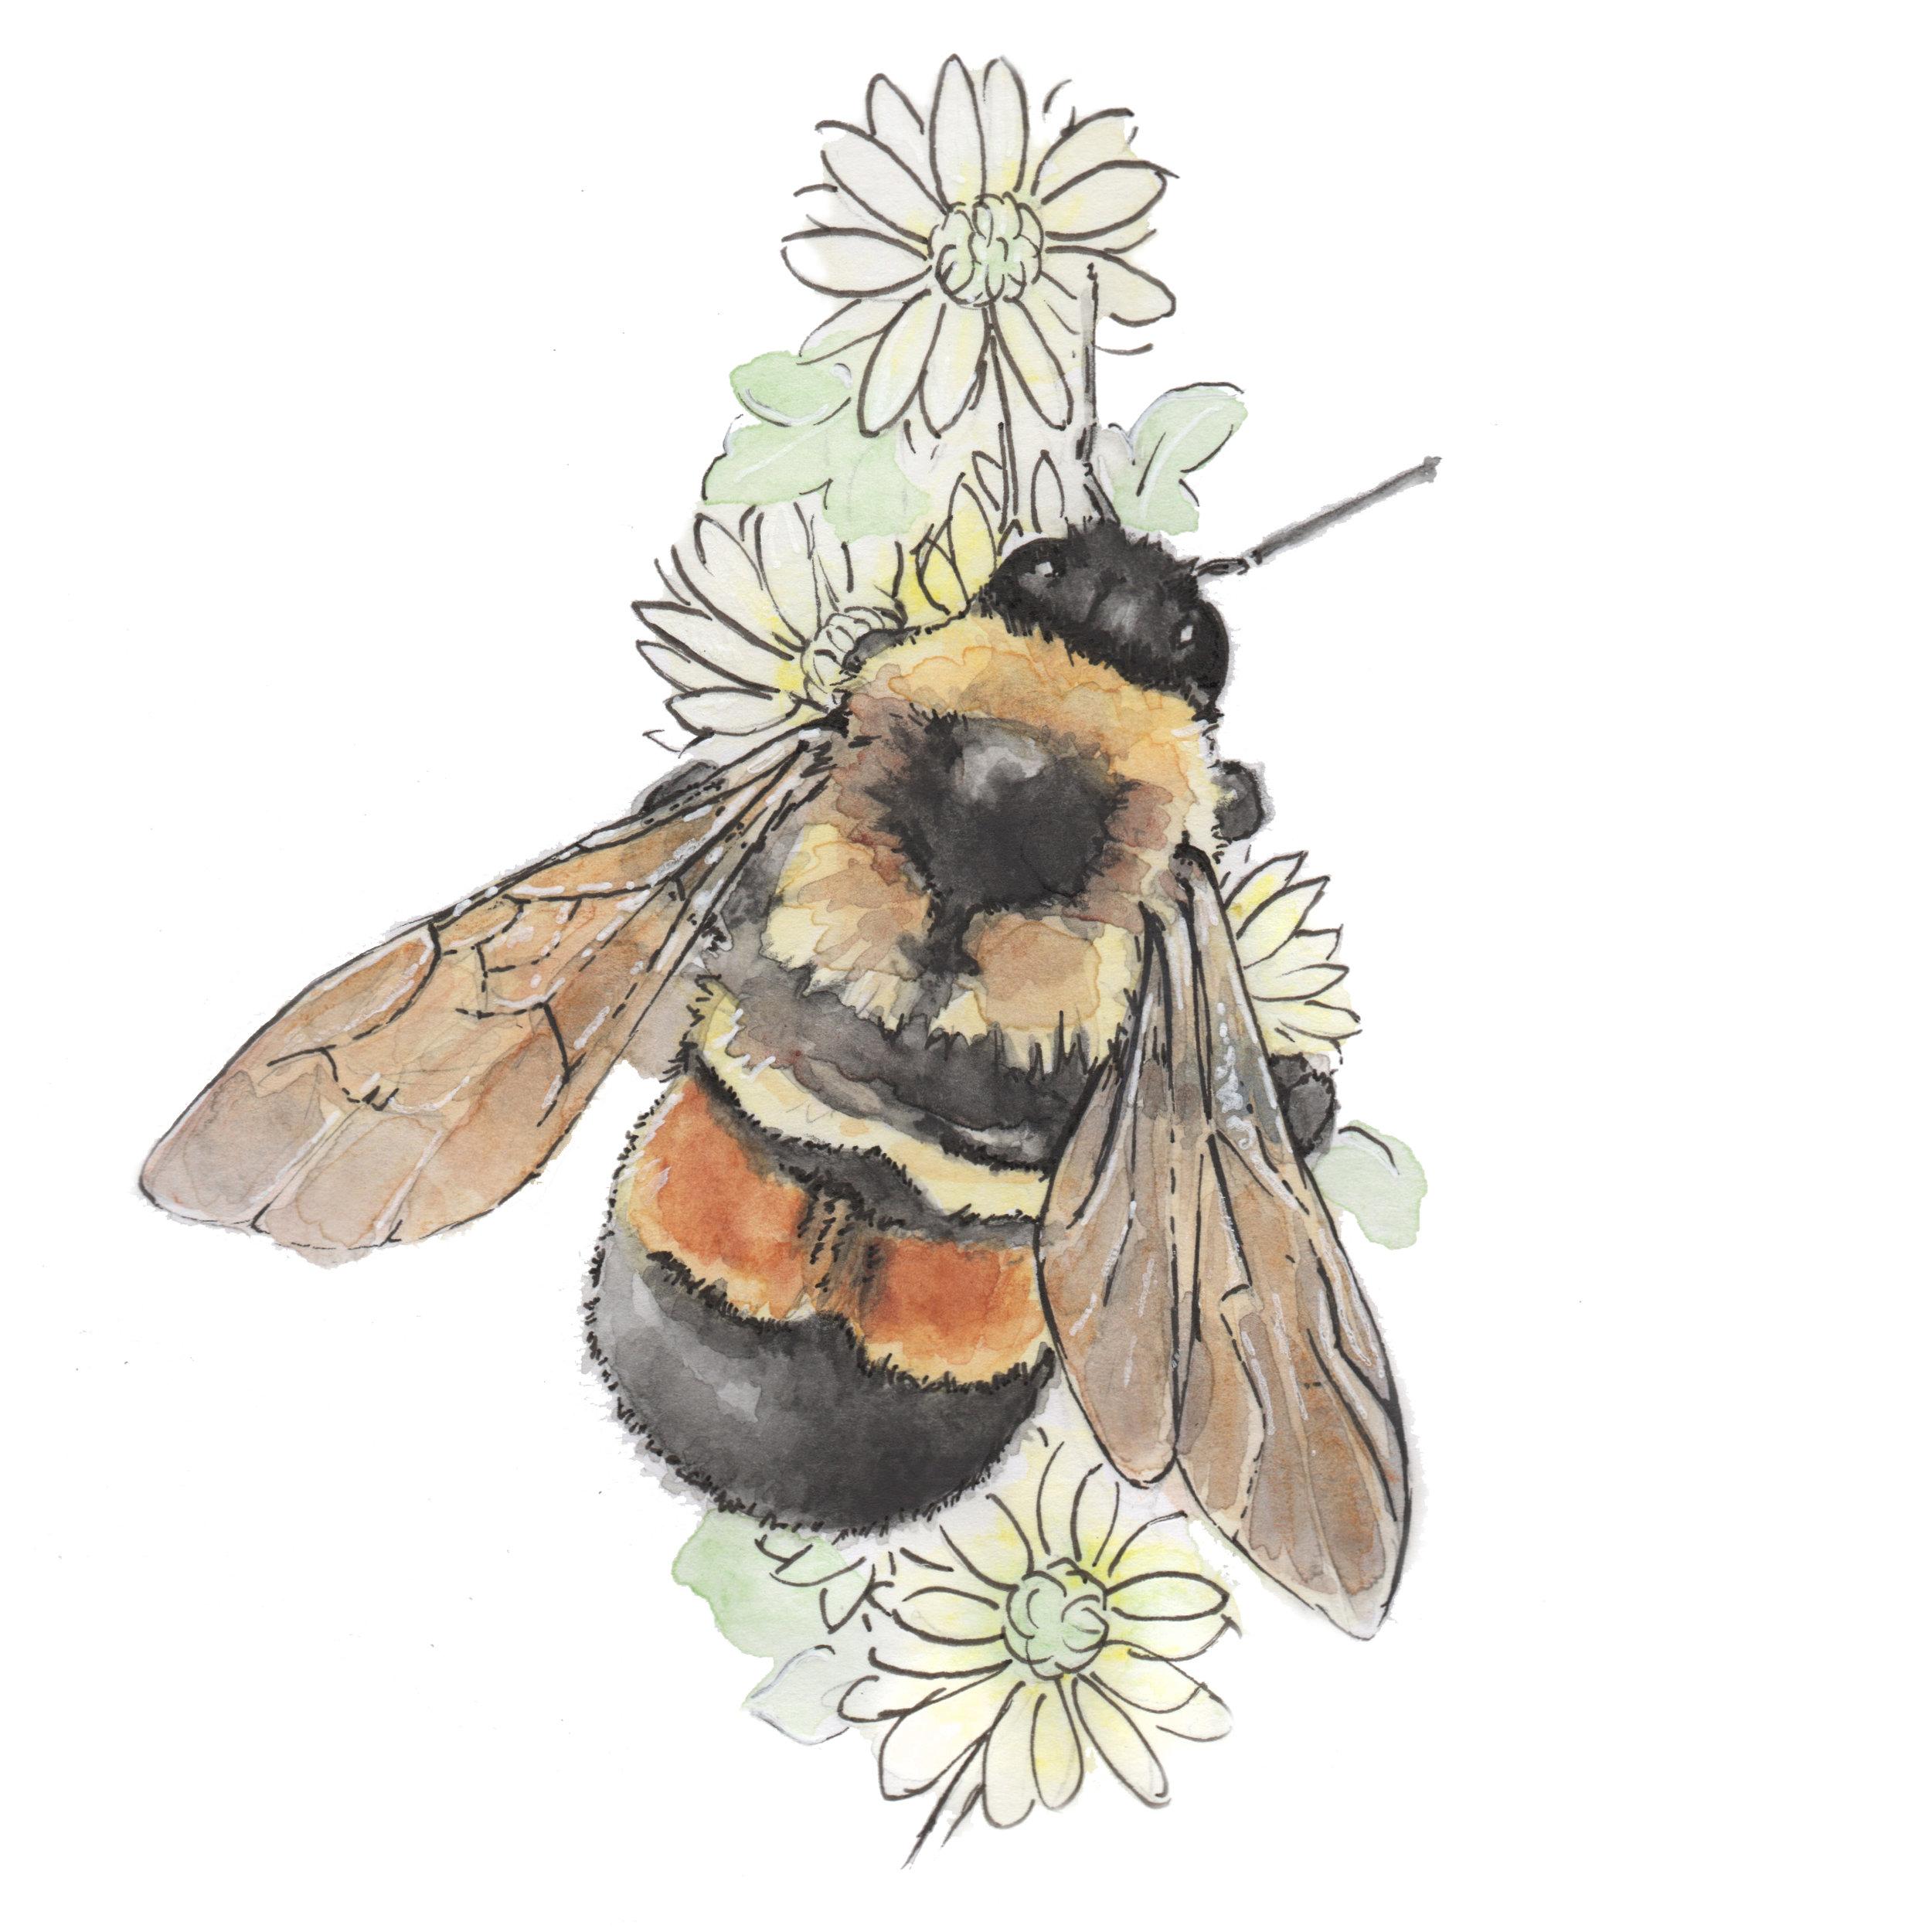 Bee_final1.jpg